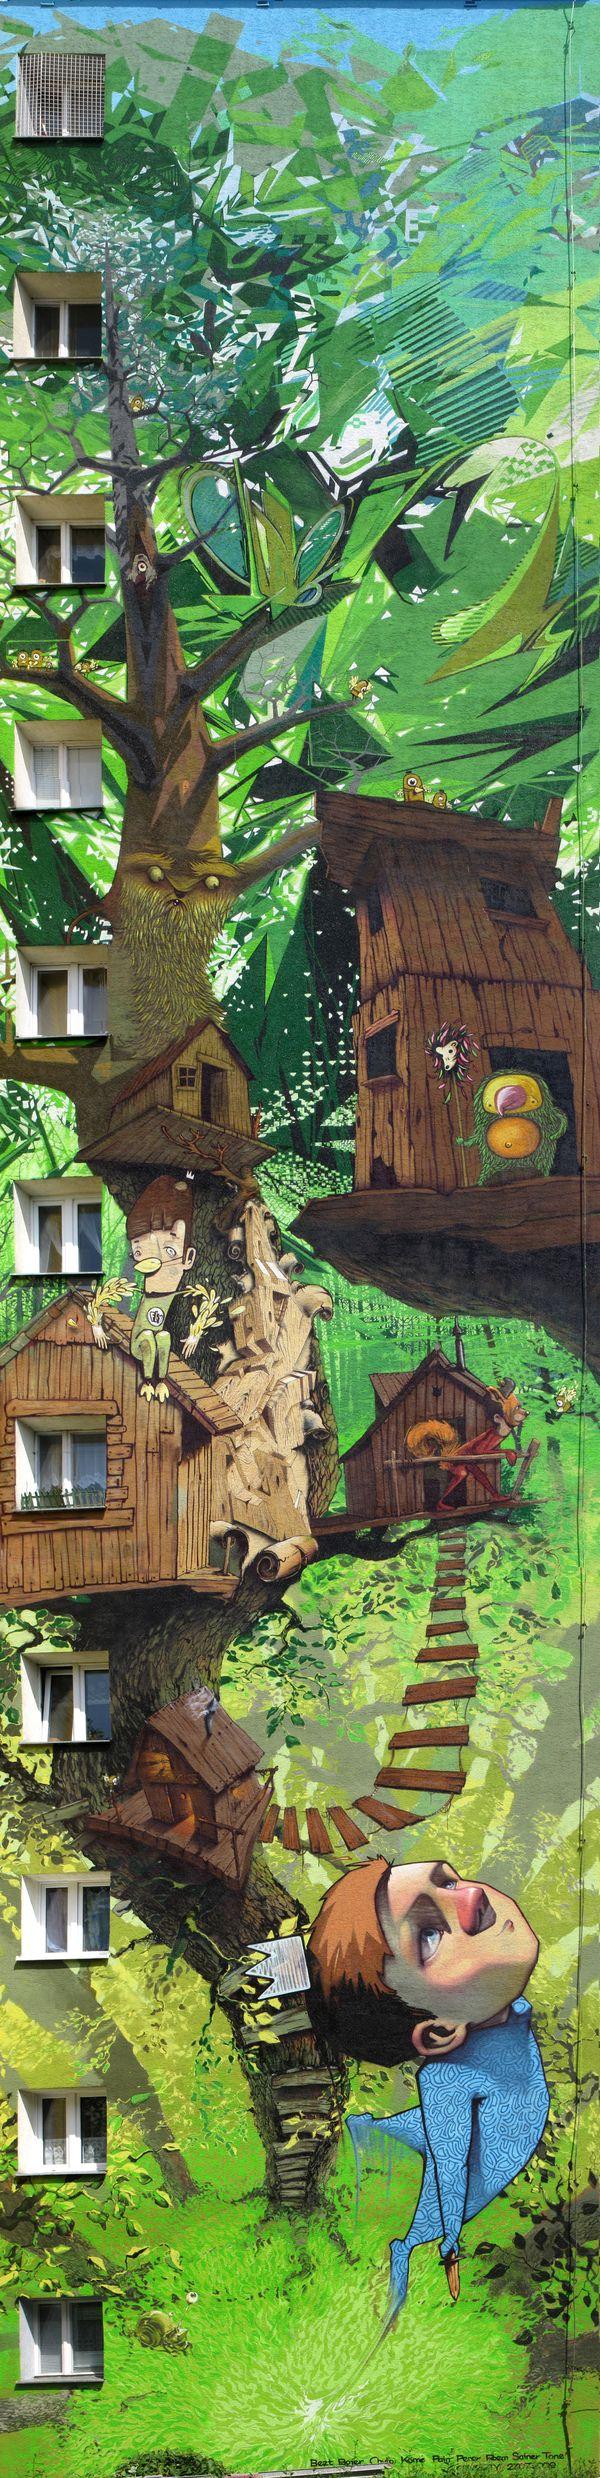 Przemek Blejzyk, Bezt, Boier, Chylo, Kome, Pain, Roem, Tone (C2C) Bydgoszcz/Poland #graffiti #streetart